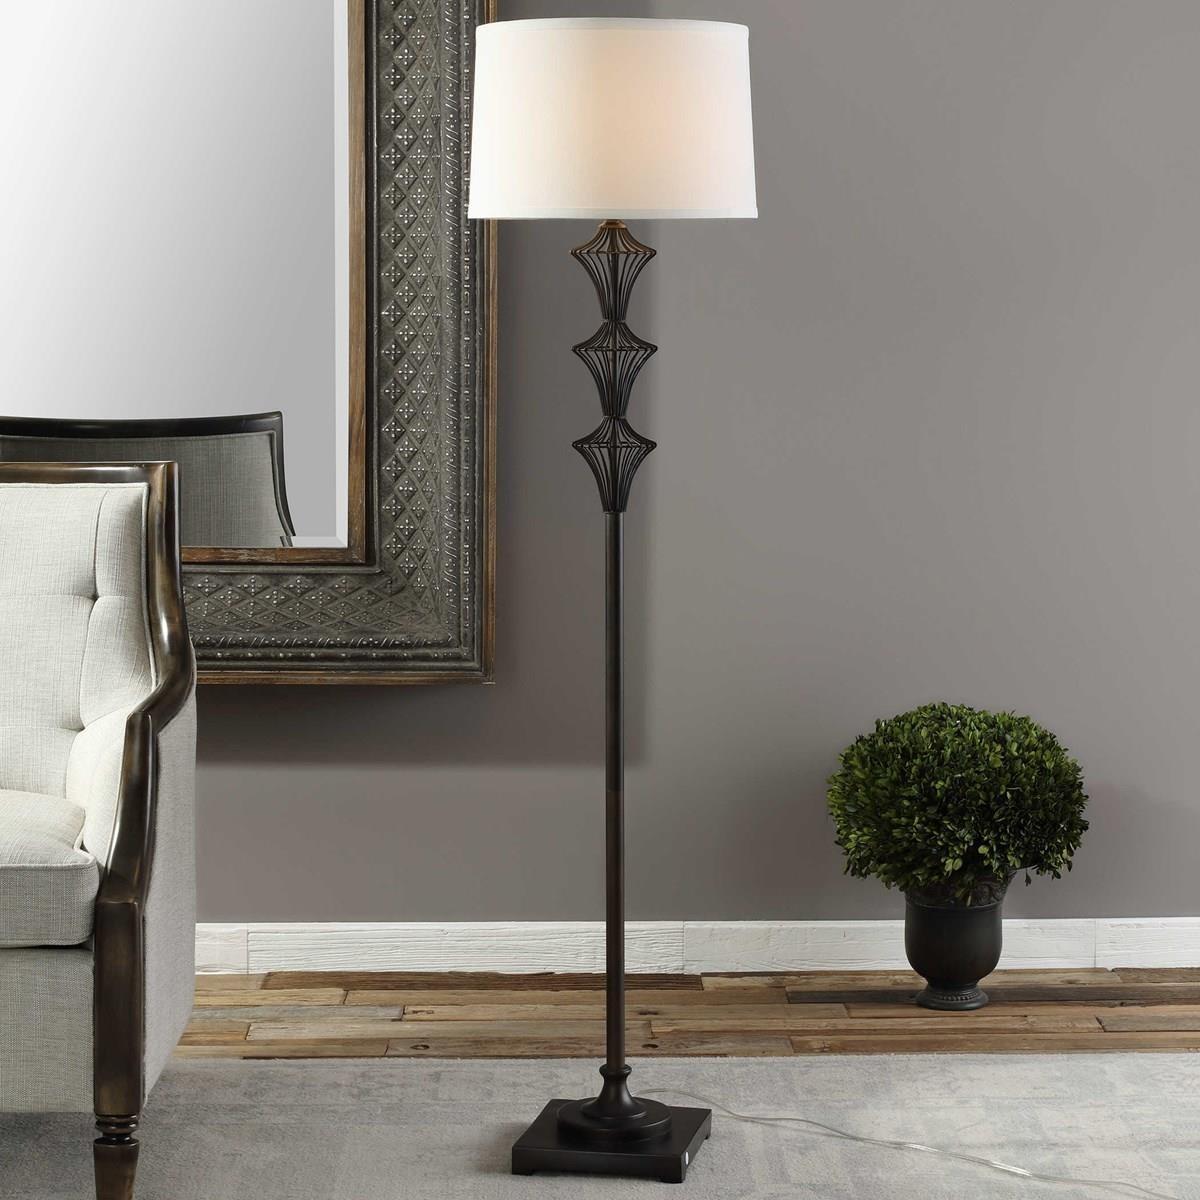 Floor Lamps NATALIA FLOOR LAMP by Unique at Walker's Furniture